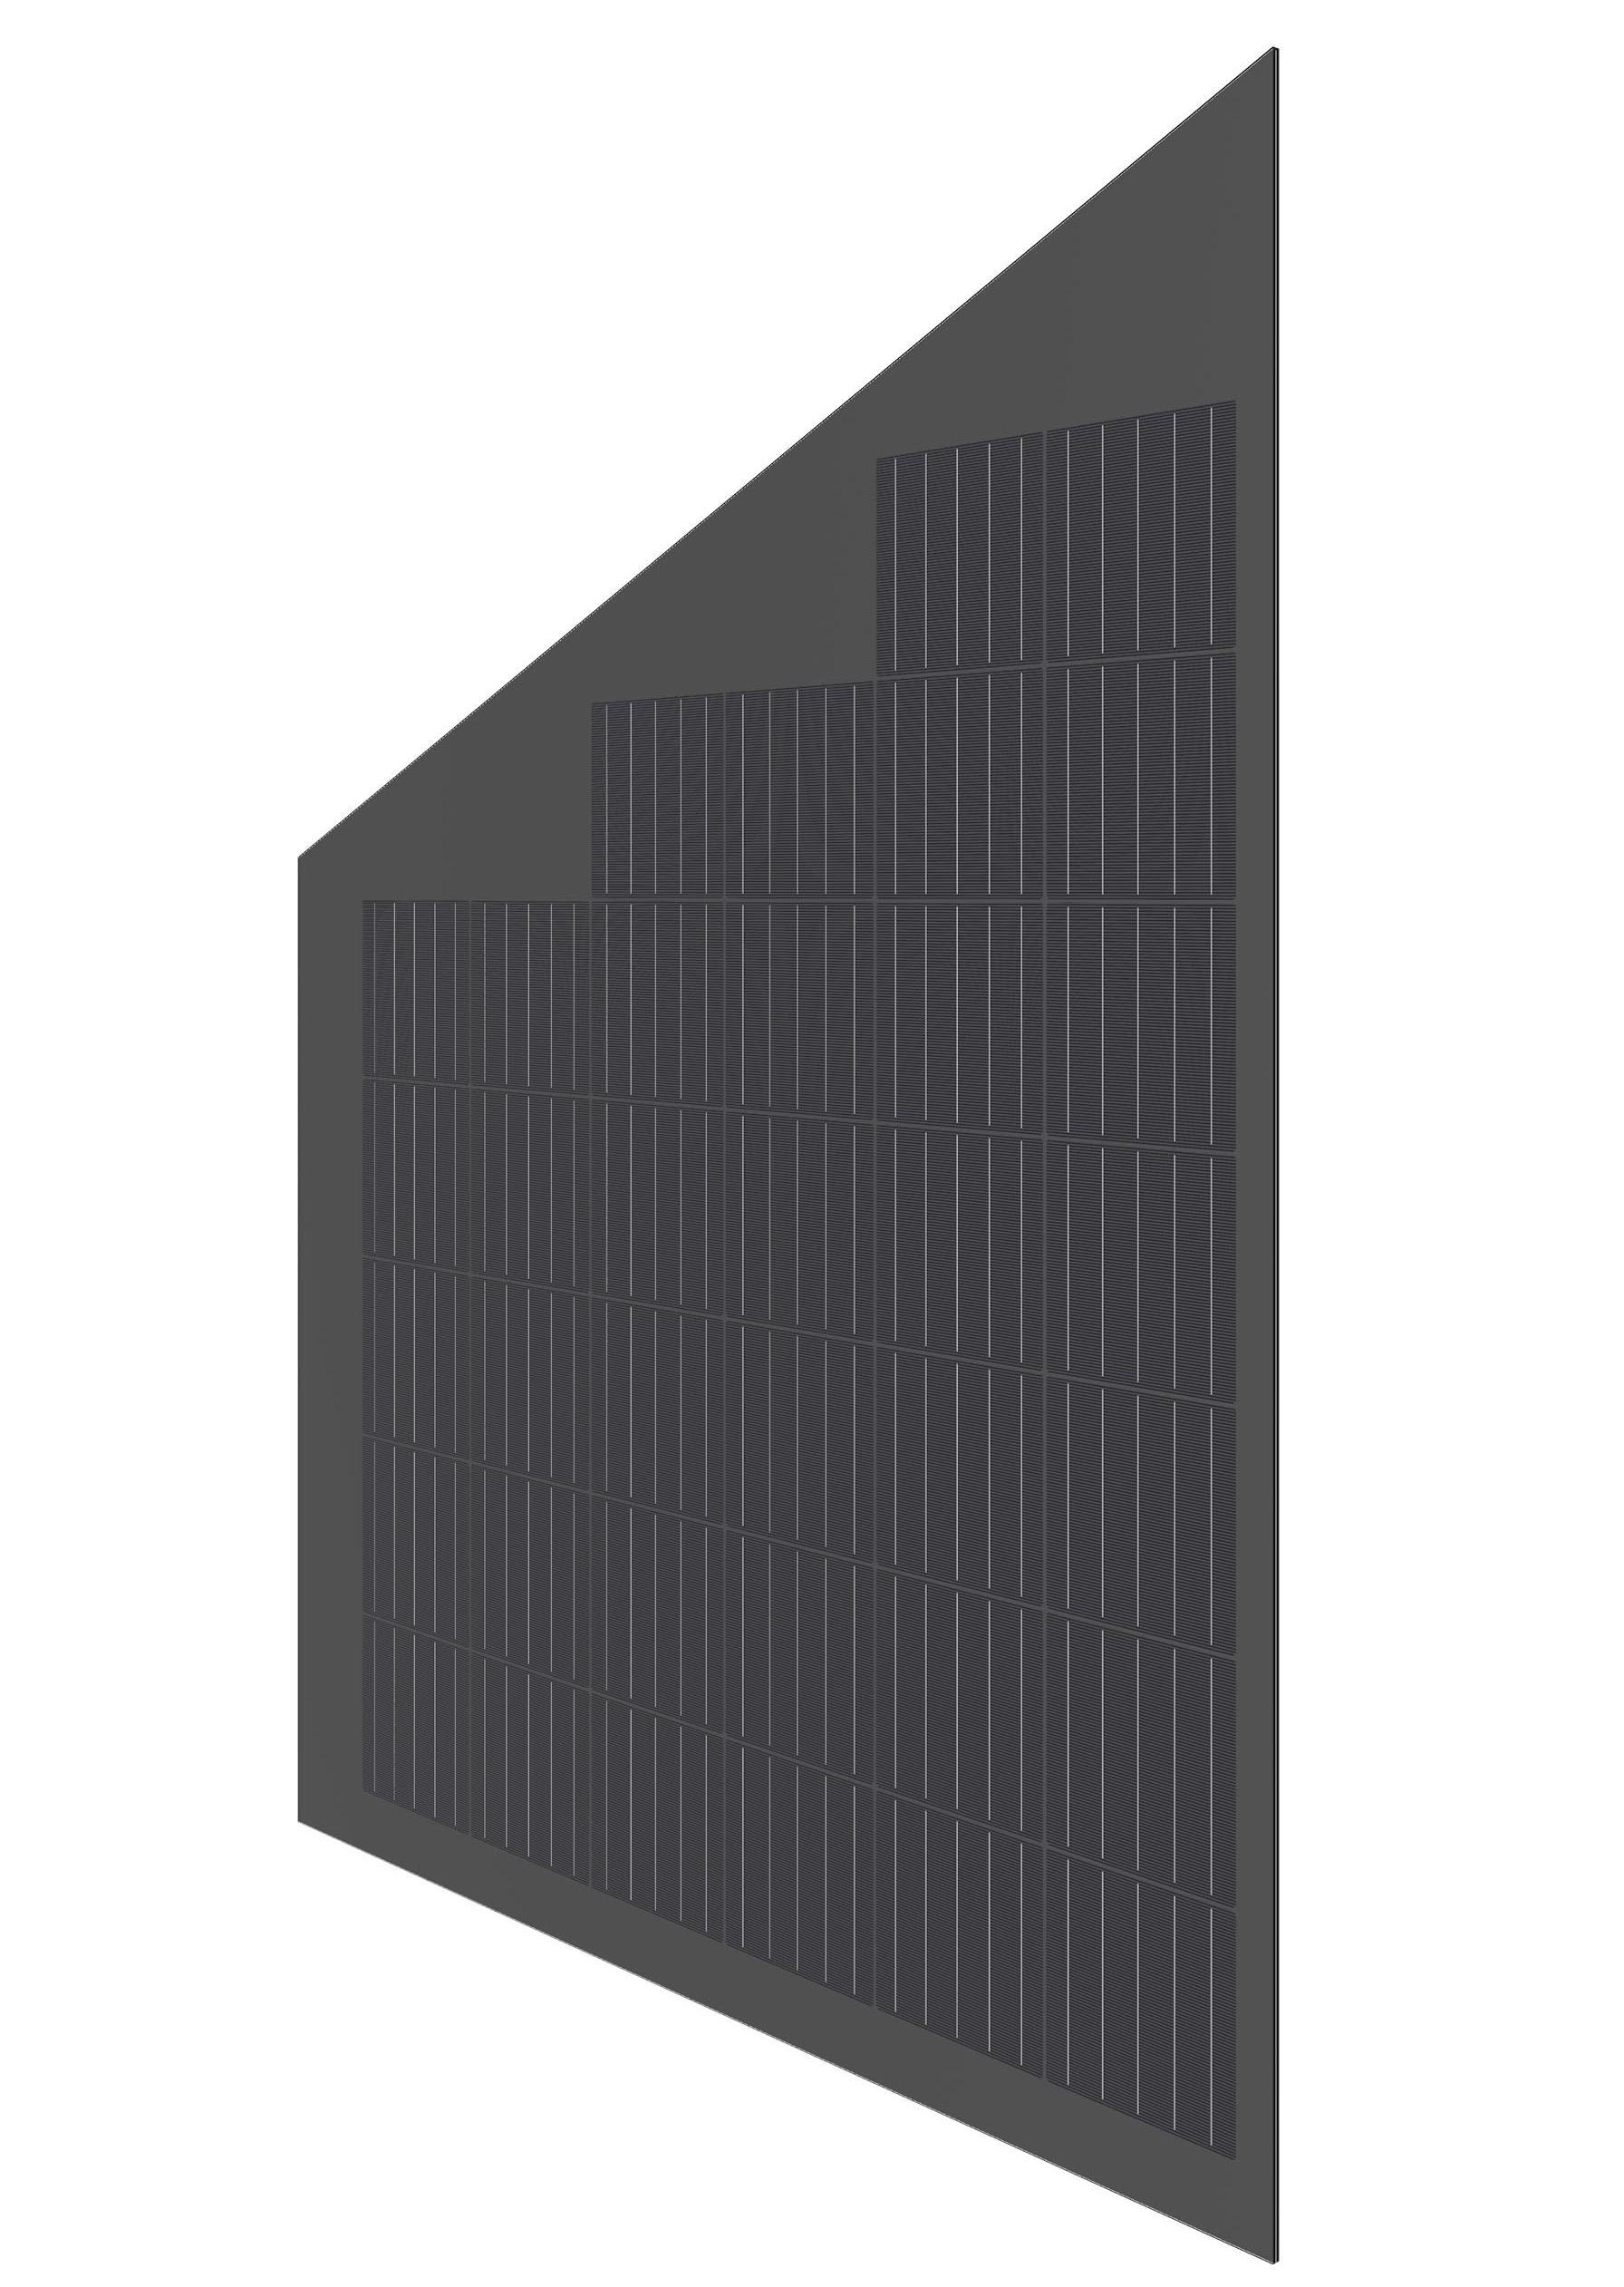 LEVEL Sondermodul Kat 2 M3 5BB